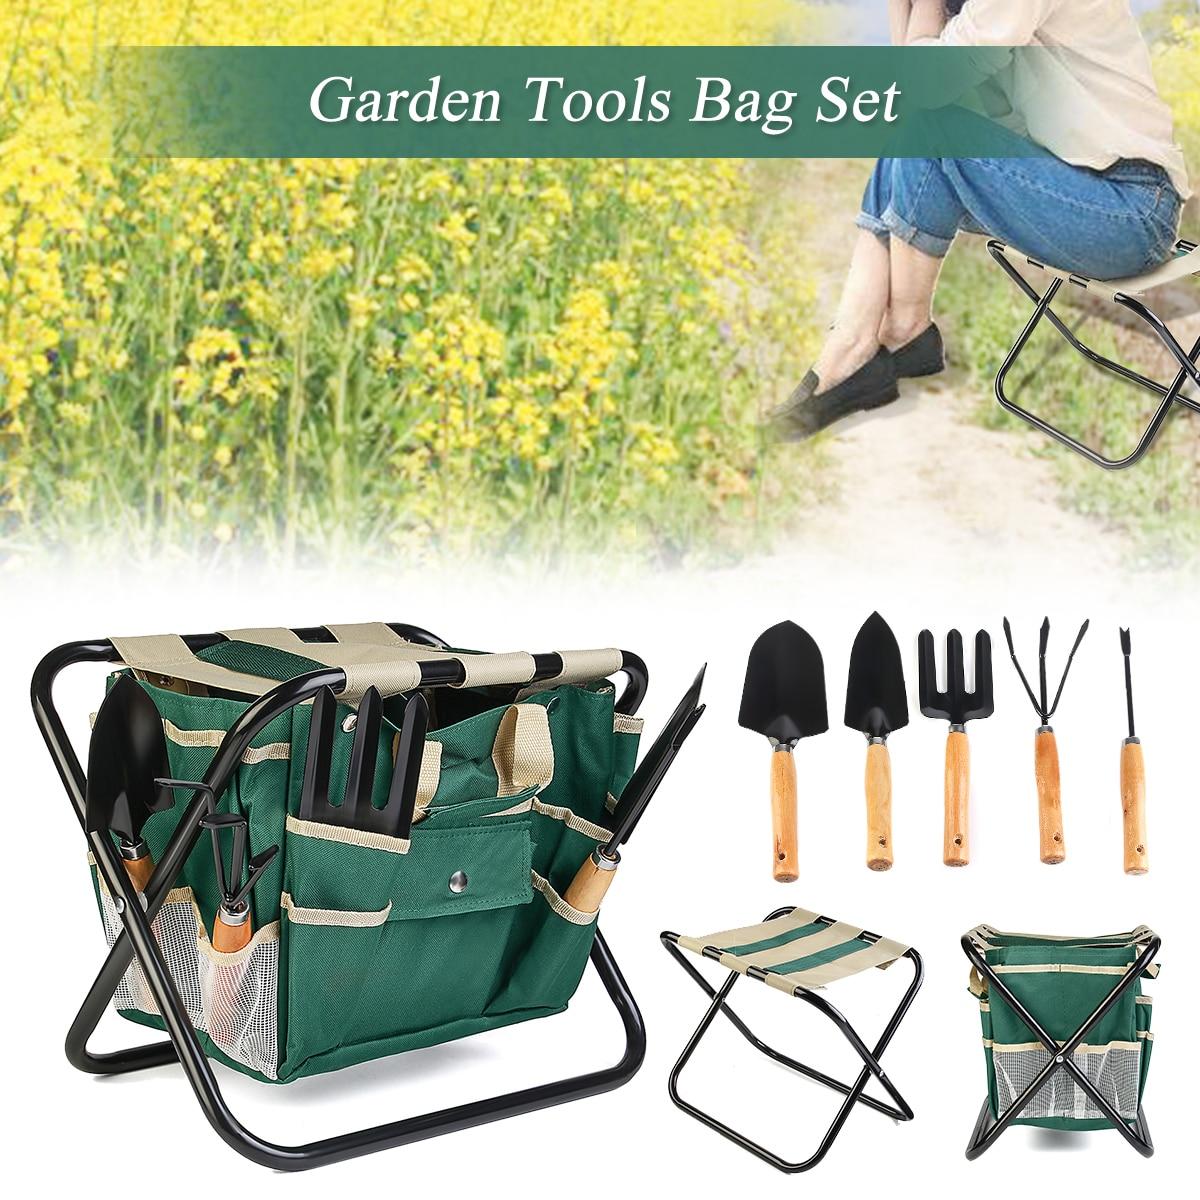 7Pcs Folding Stool Chair Yard Gardening Tool Kit Heavy Duty Garden Tools Bag Set Stainless Steel Lightweight 600D Oxford Fabric цена